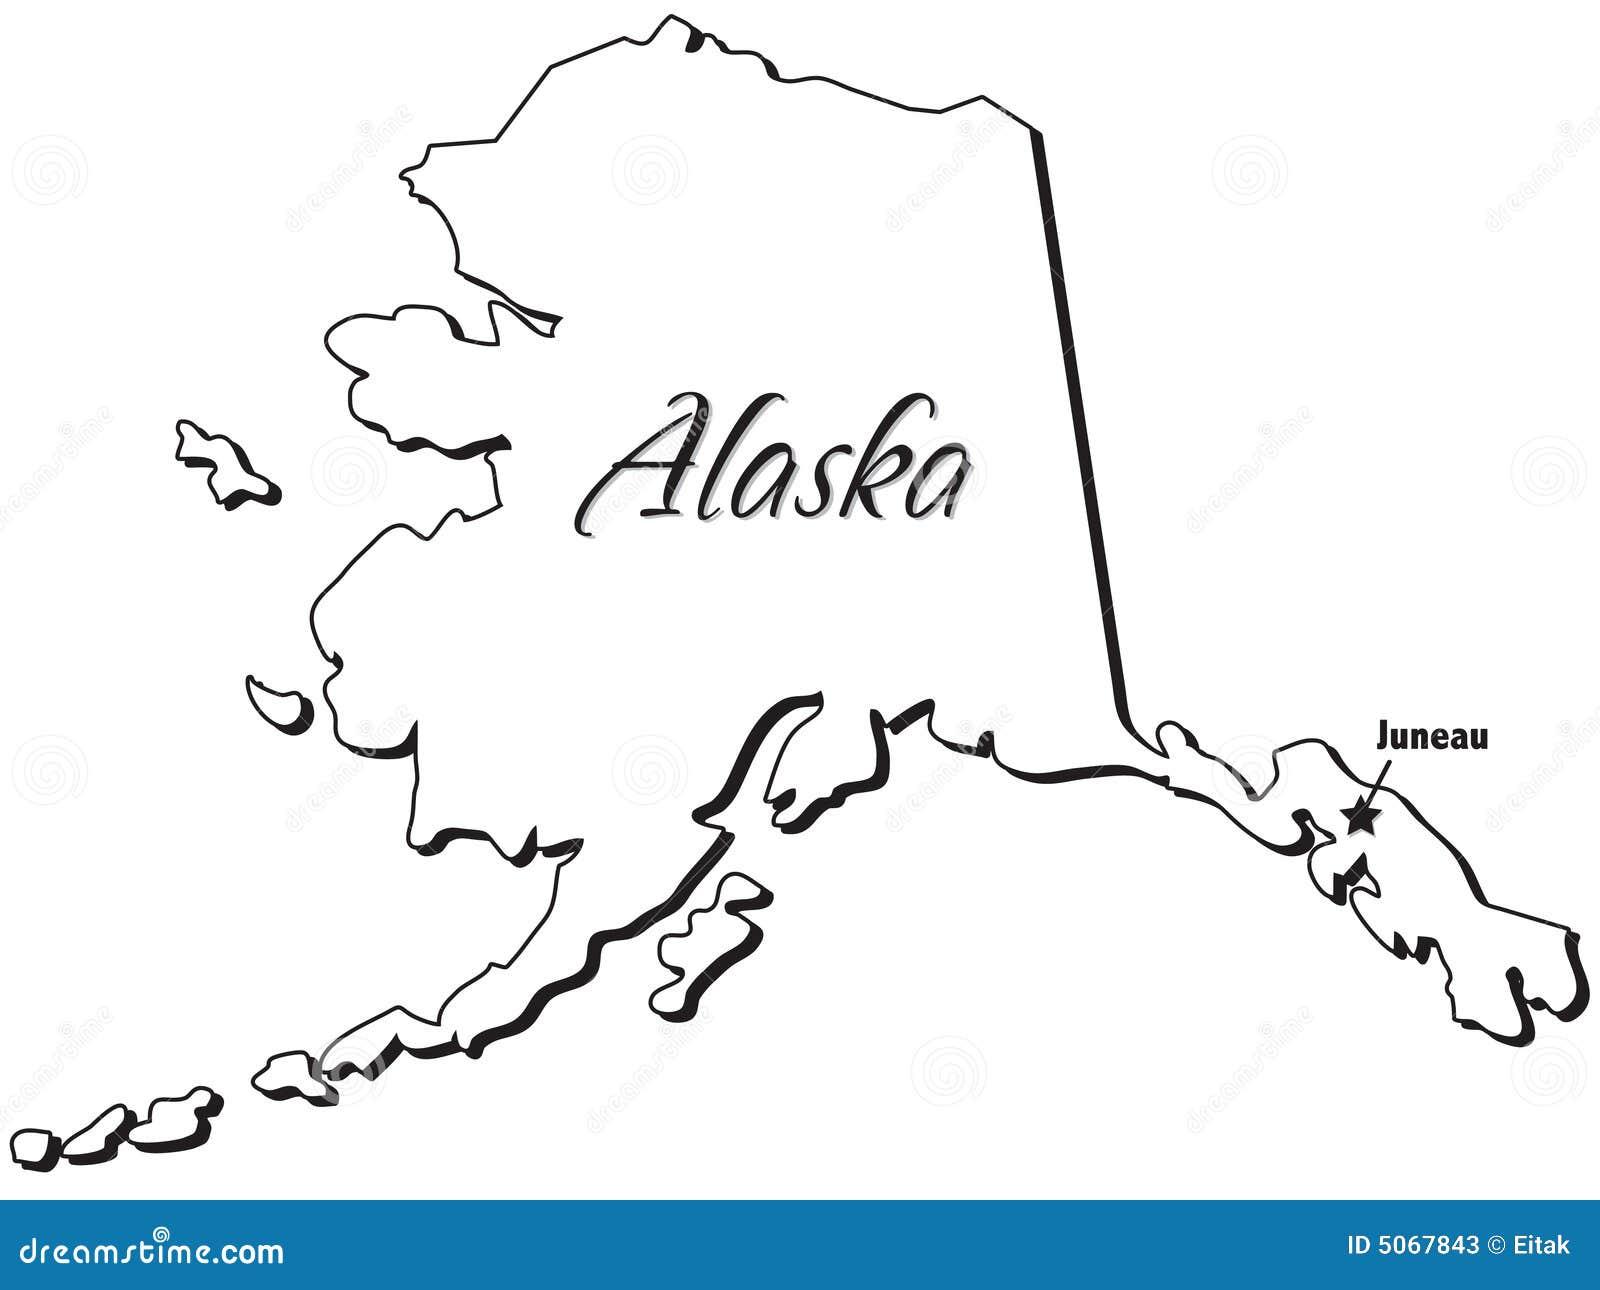 State Of Alaska Outline Stock Photos  Image 5067843